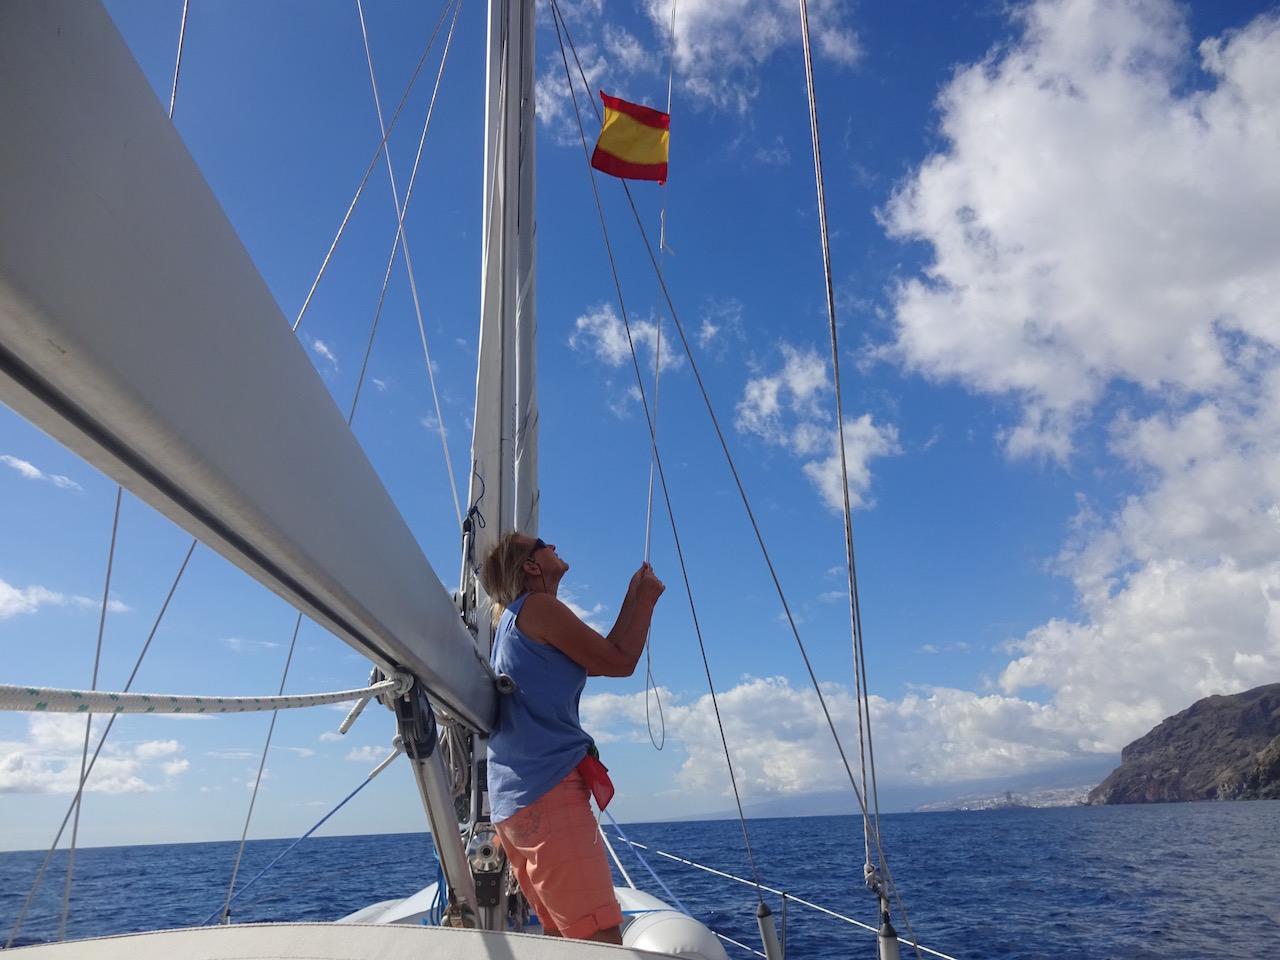 die nächste Gastlandflagge ist die von Barbados